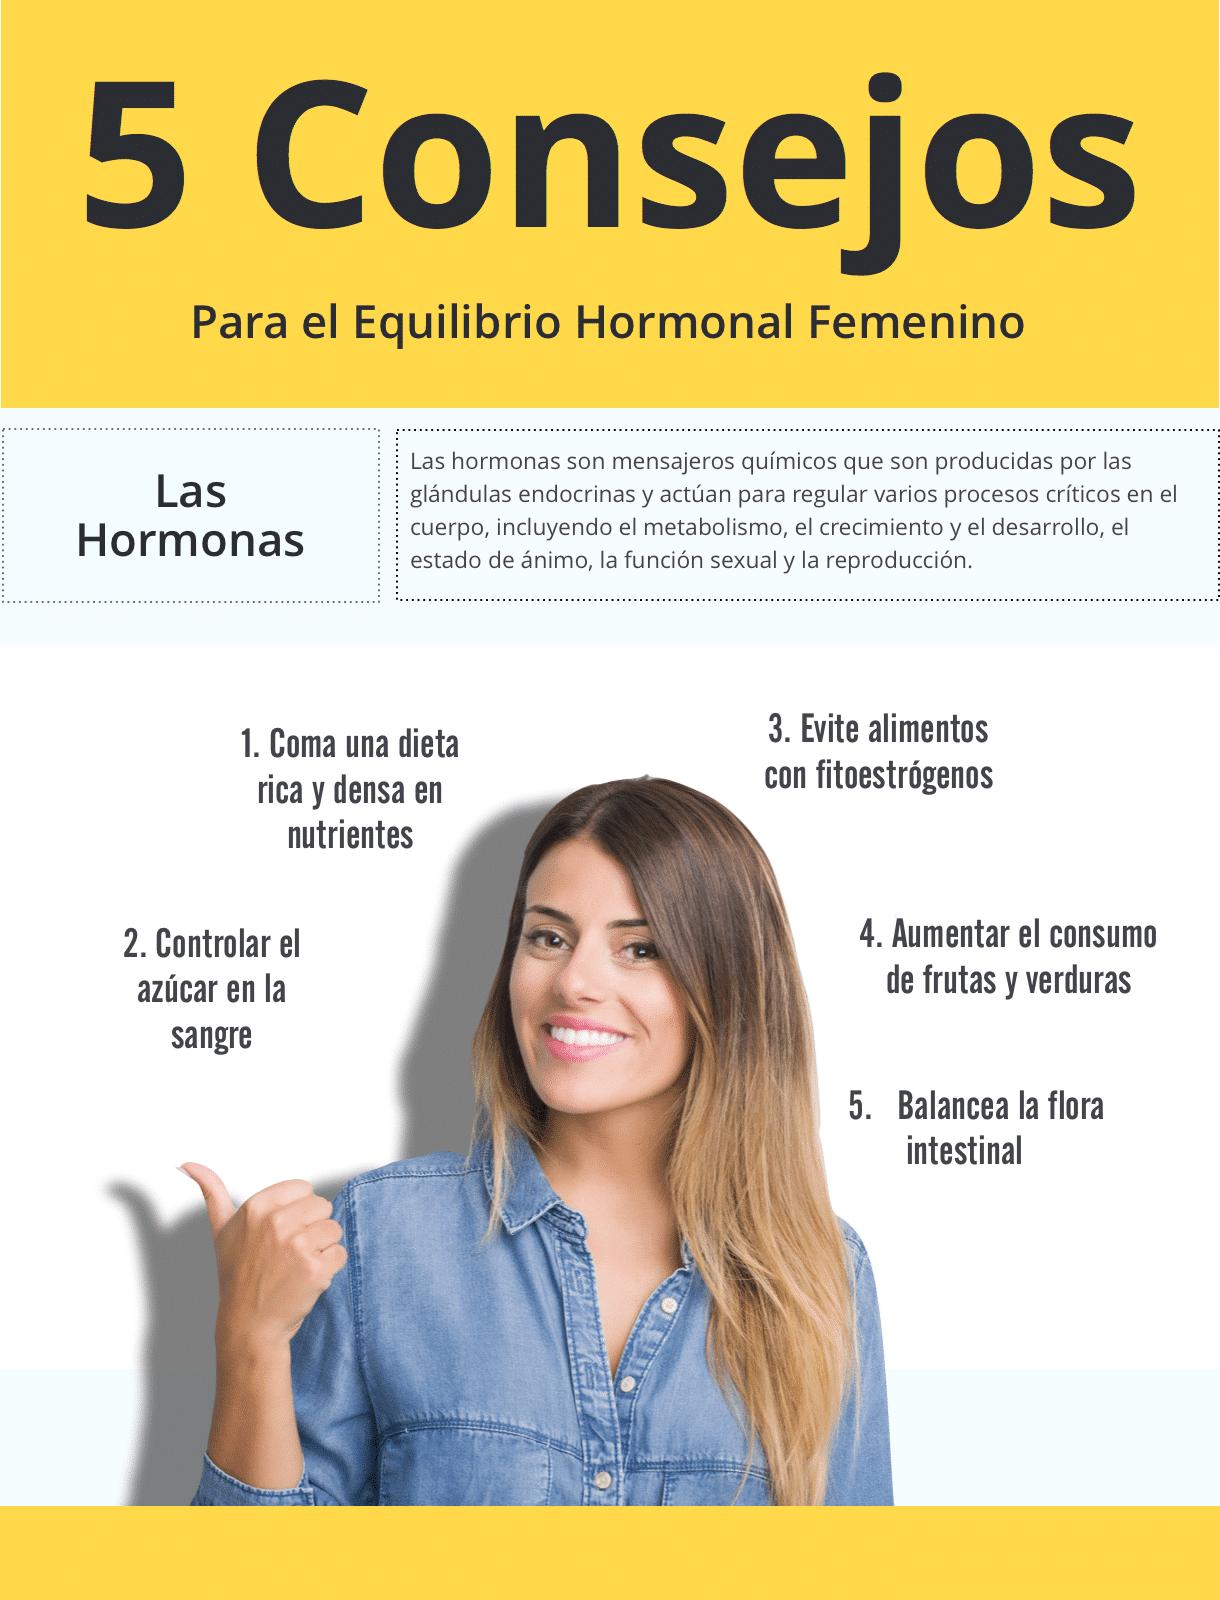 el equilibrio hormonal femenino